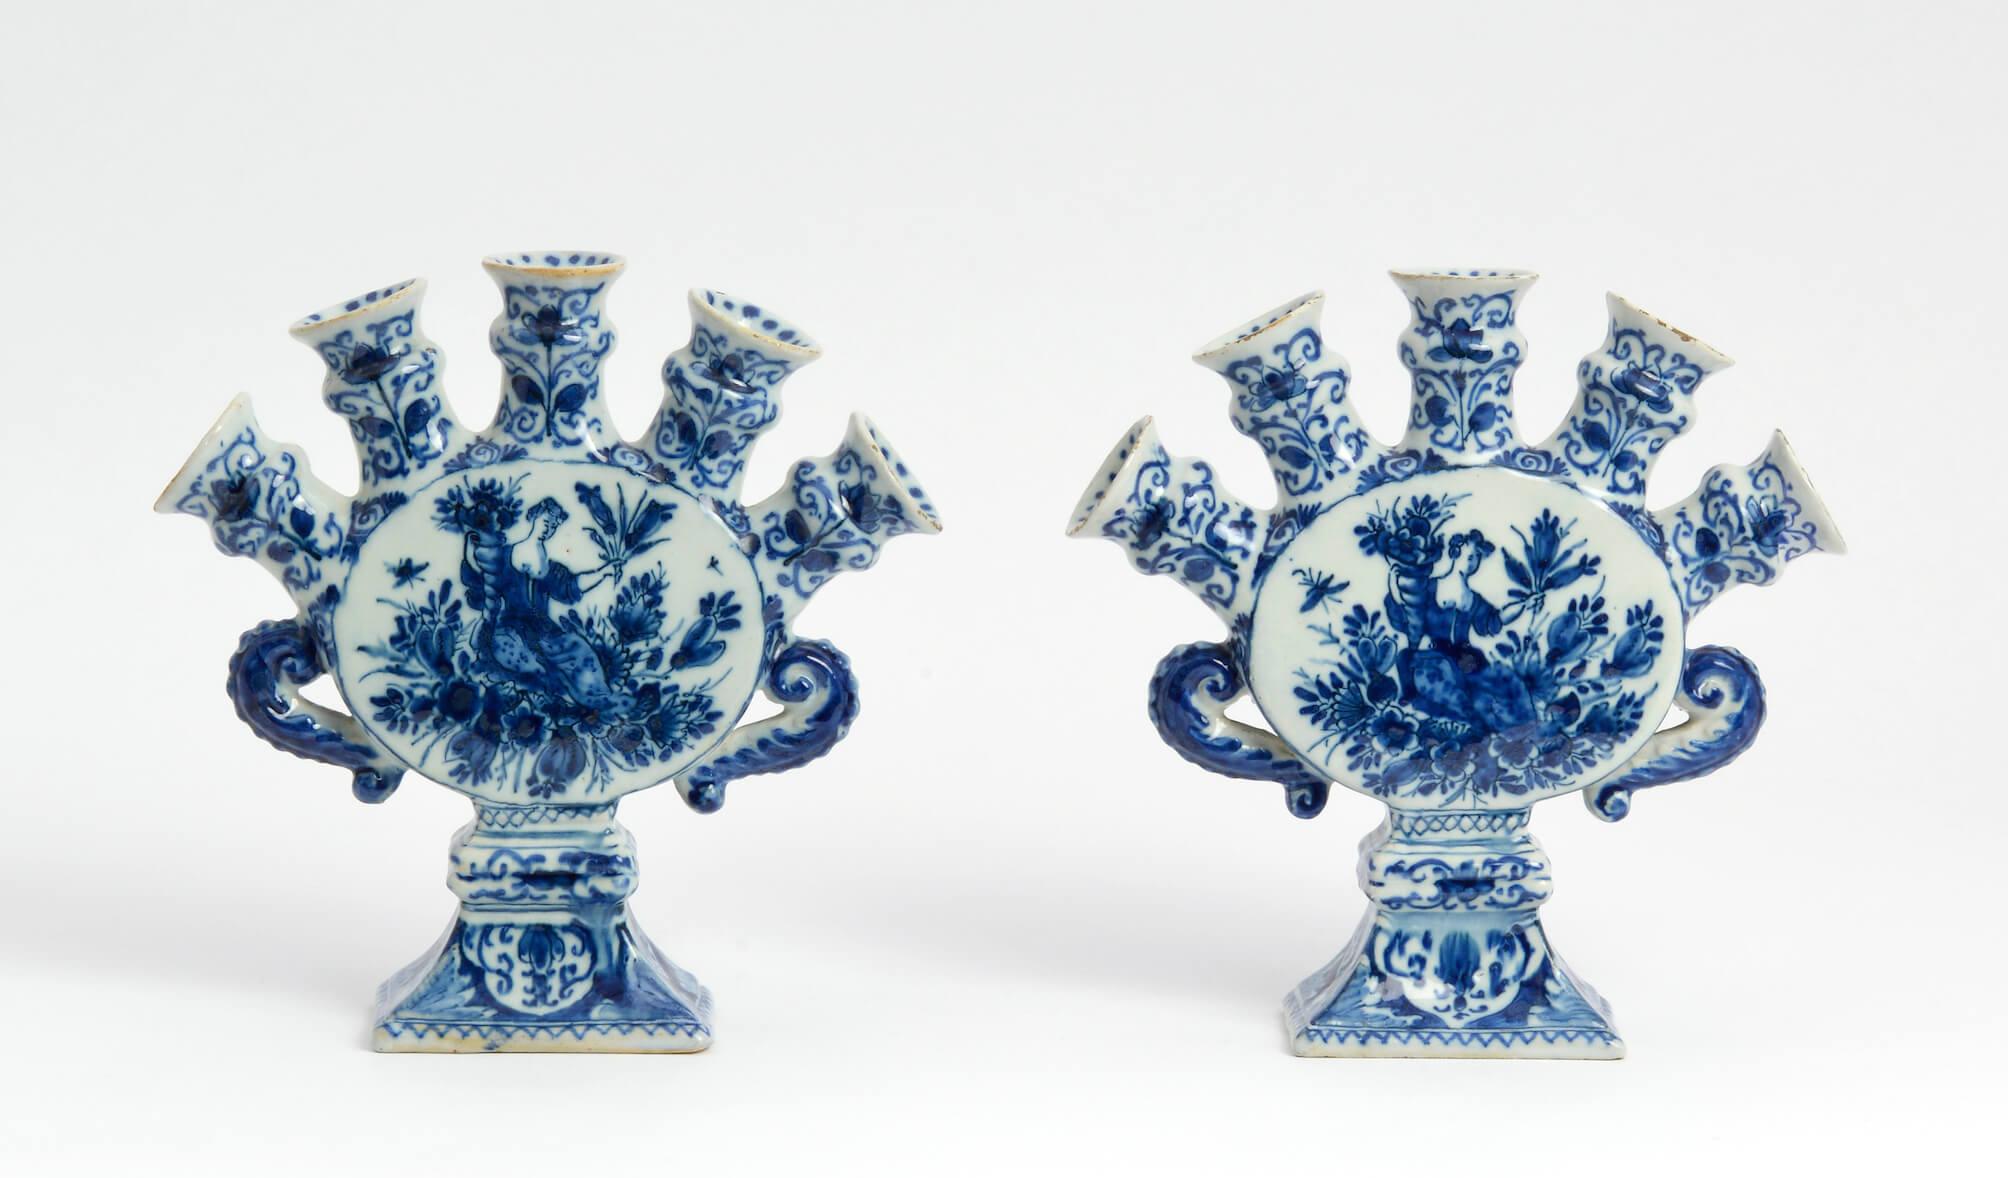 •D18001. Pair of Blue and White Flower Vases